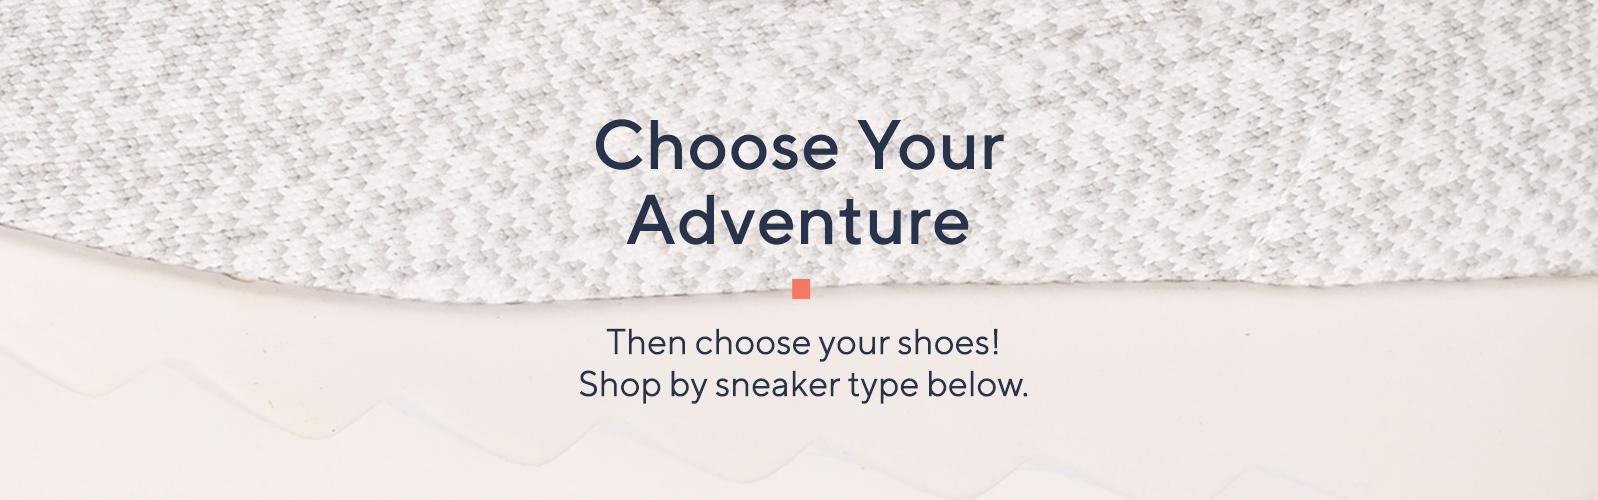 Sneakers — Women's Sneakers - QVC.com